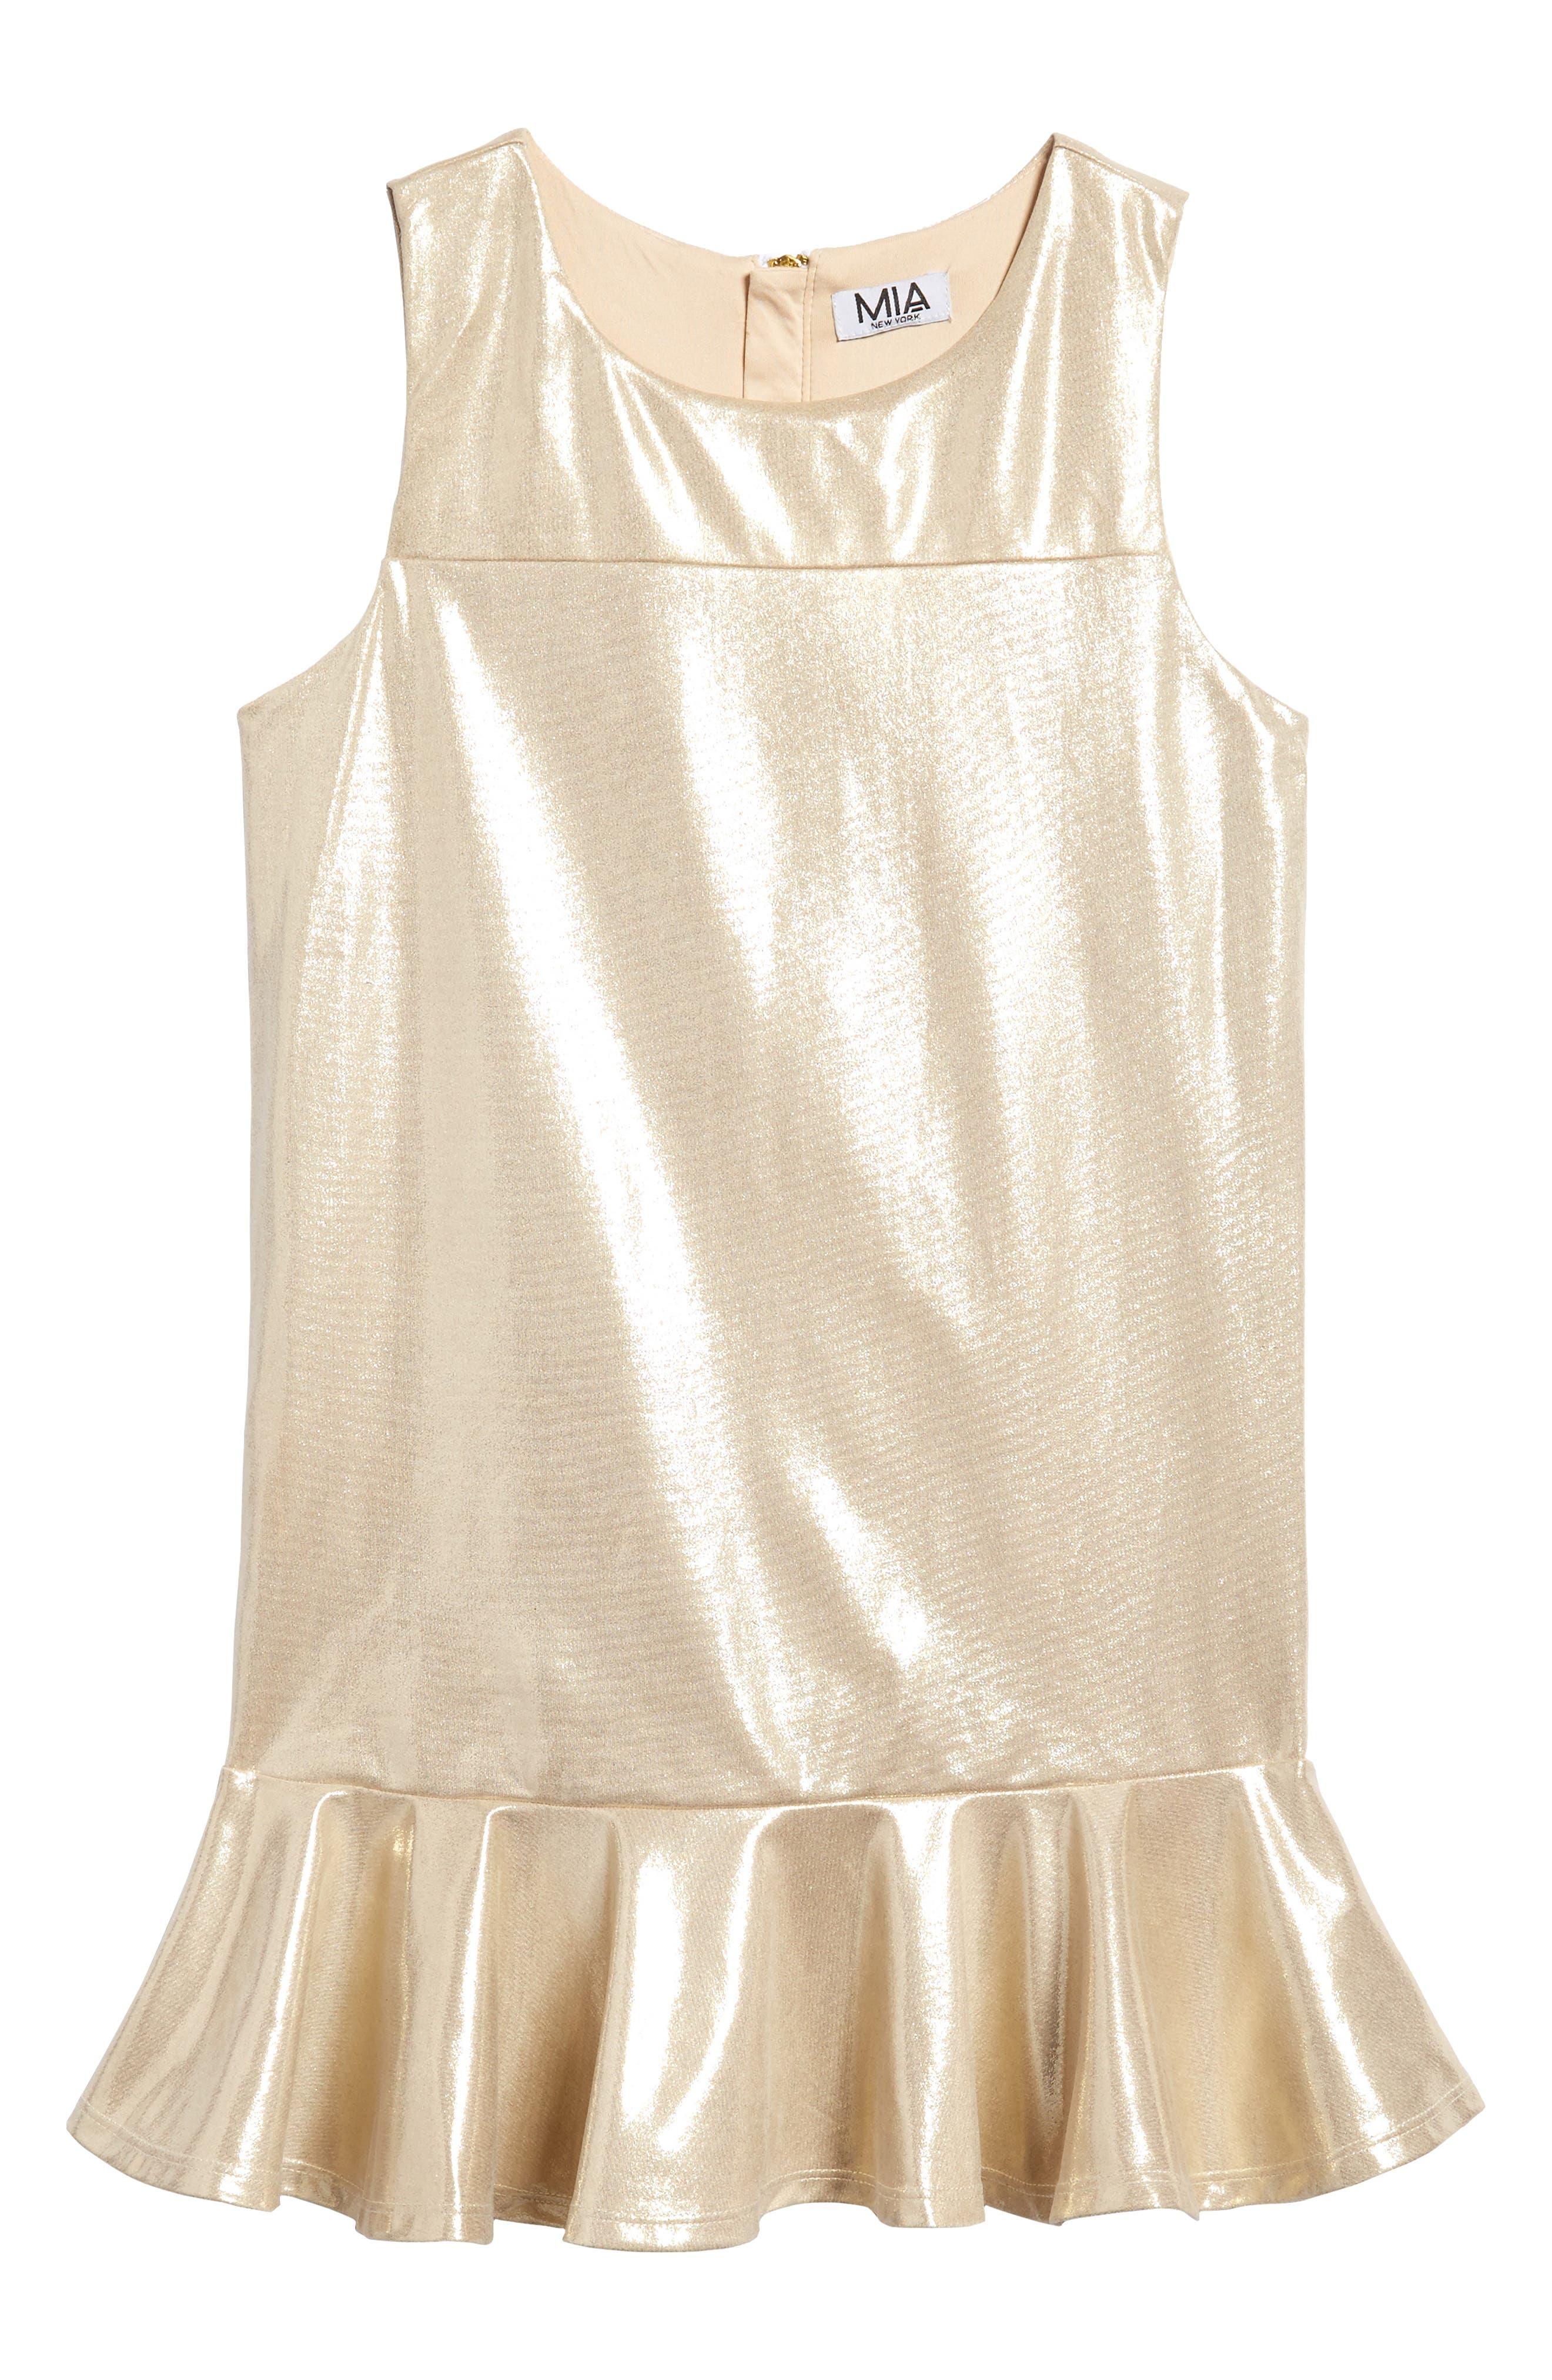 Alternate Image 1 Selected - Mia New York Liquid Shine Dress (Big Girls)